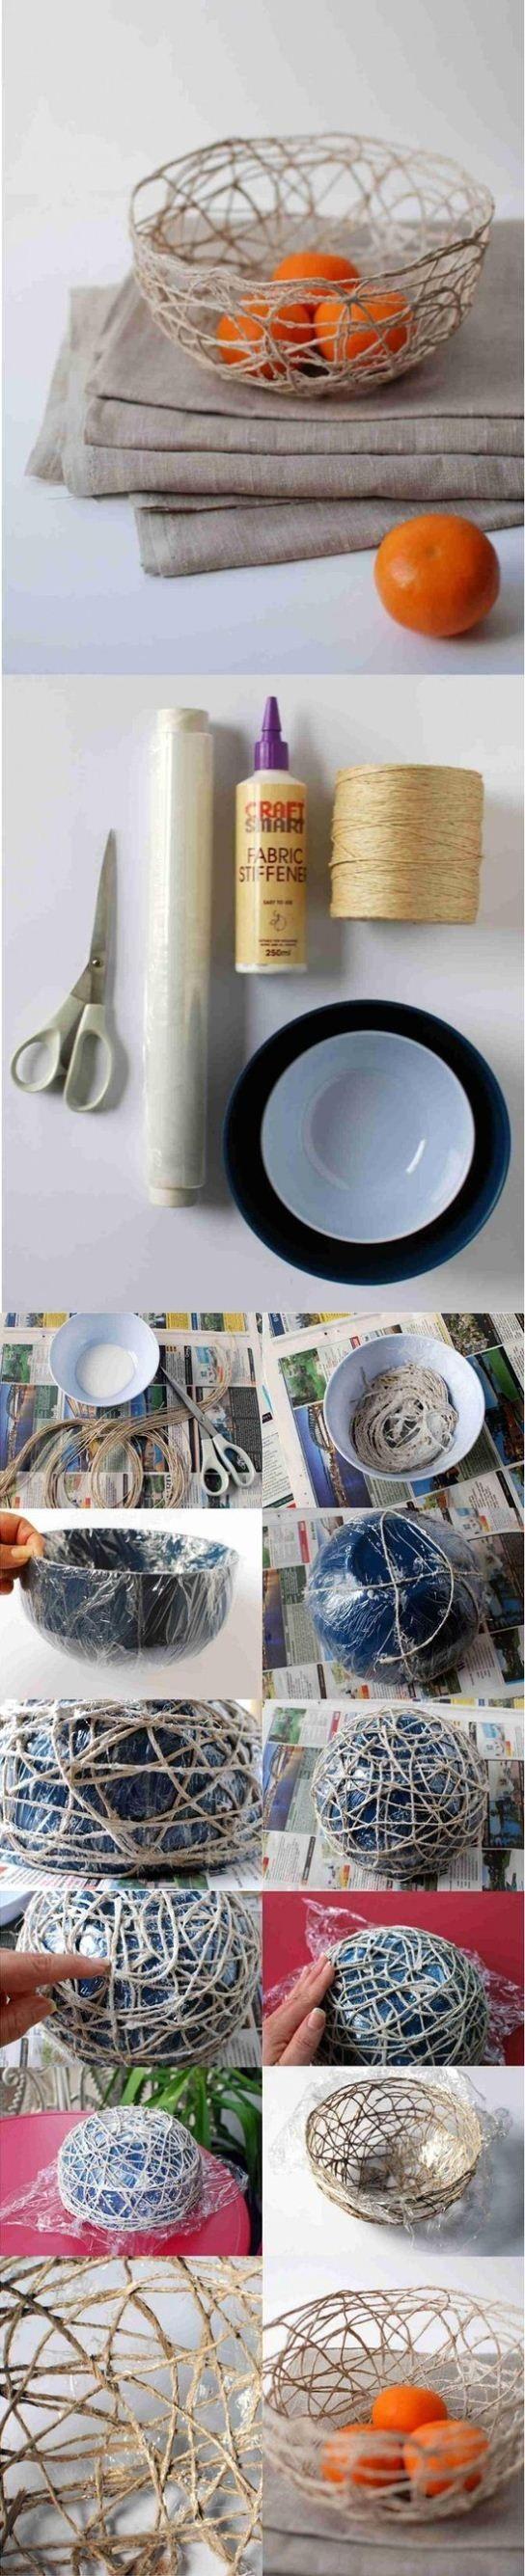 04d4b2beba9786c271243edbdc82afa6 18 Creative And Useful Popular DIY Ideas